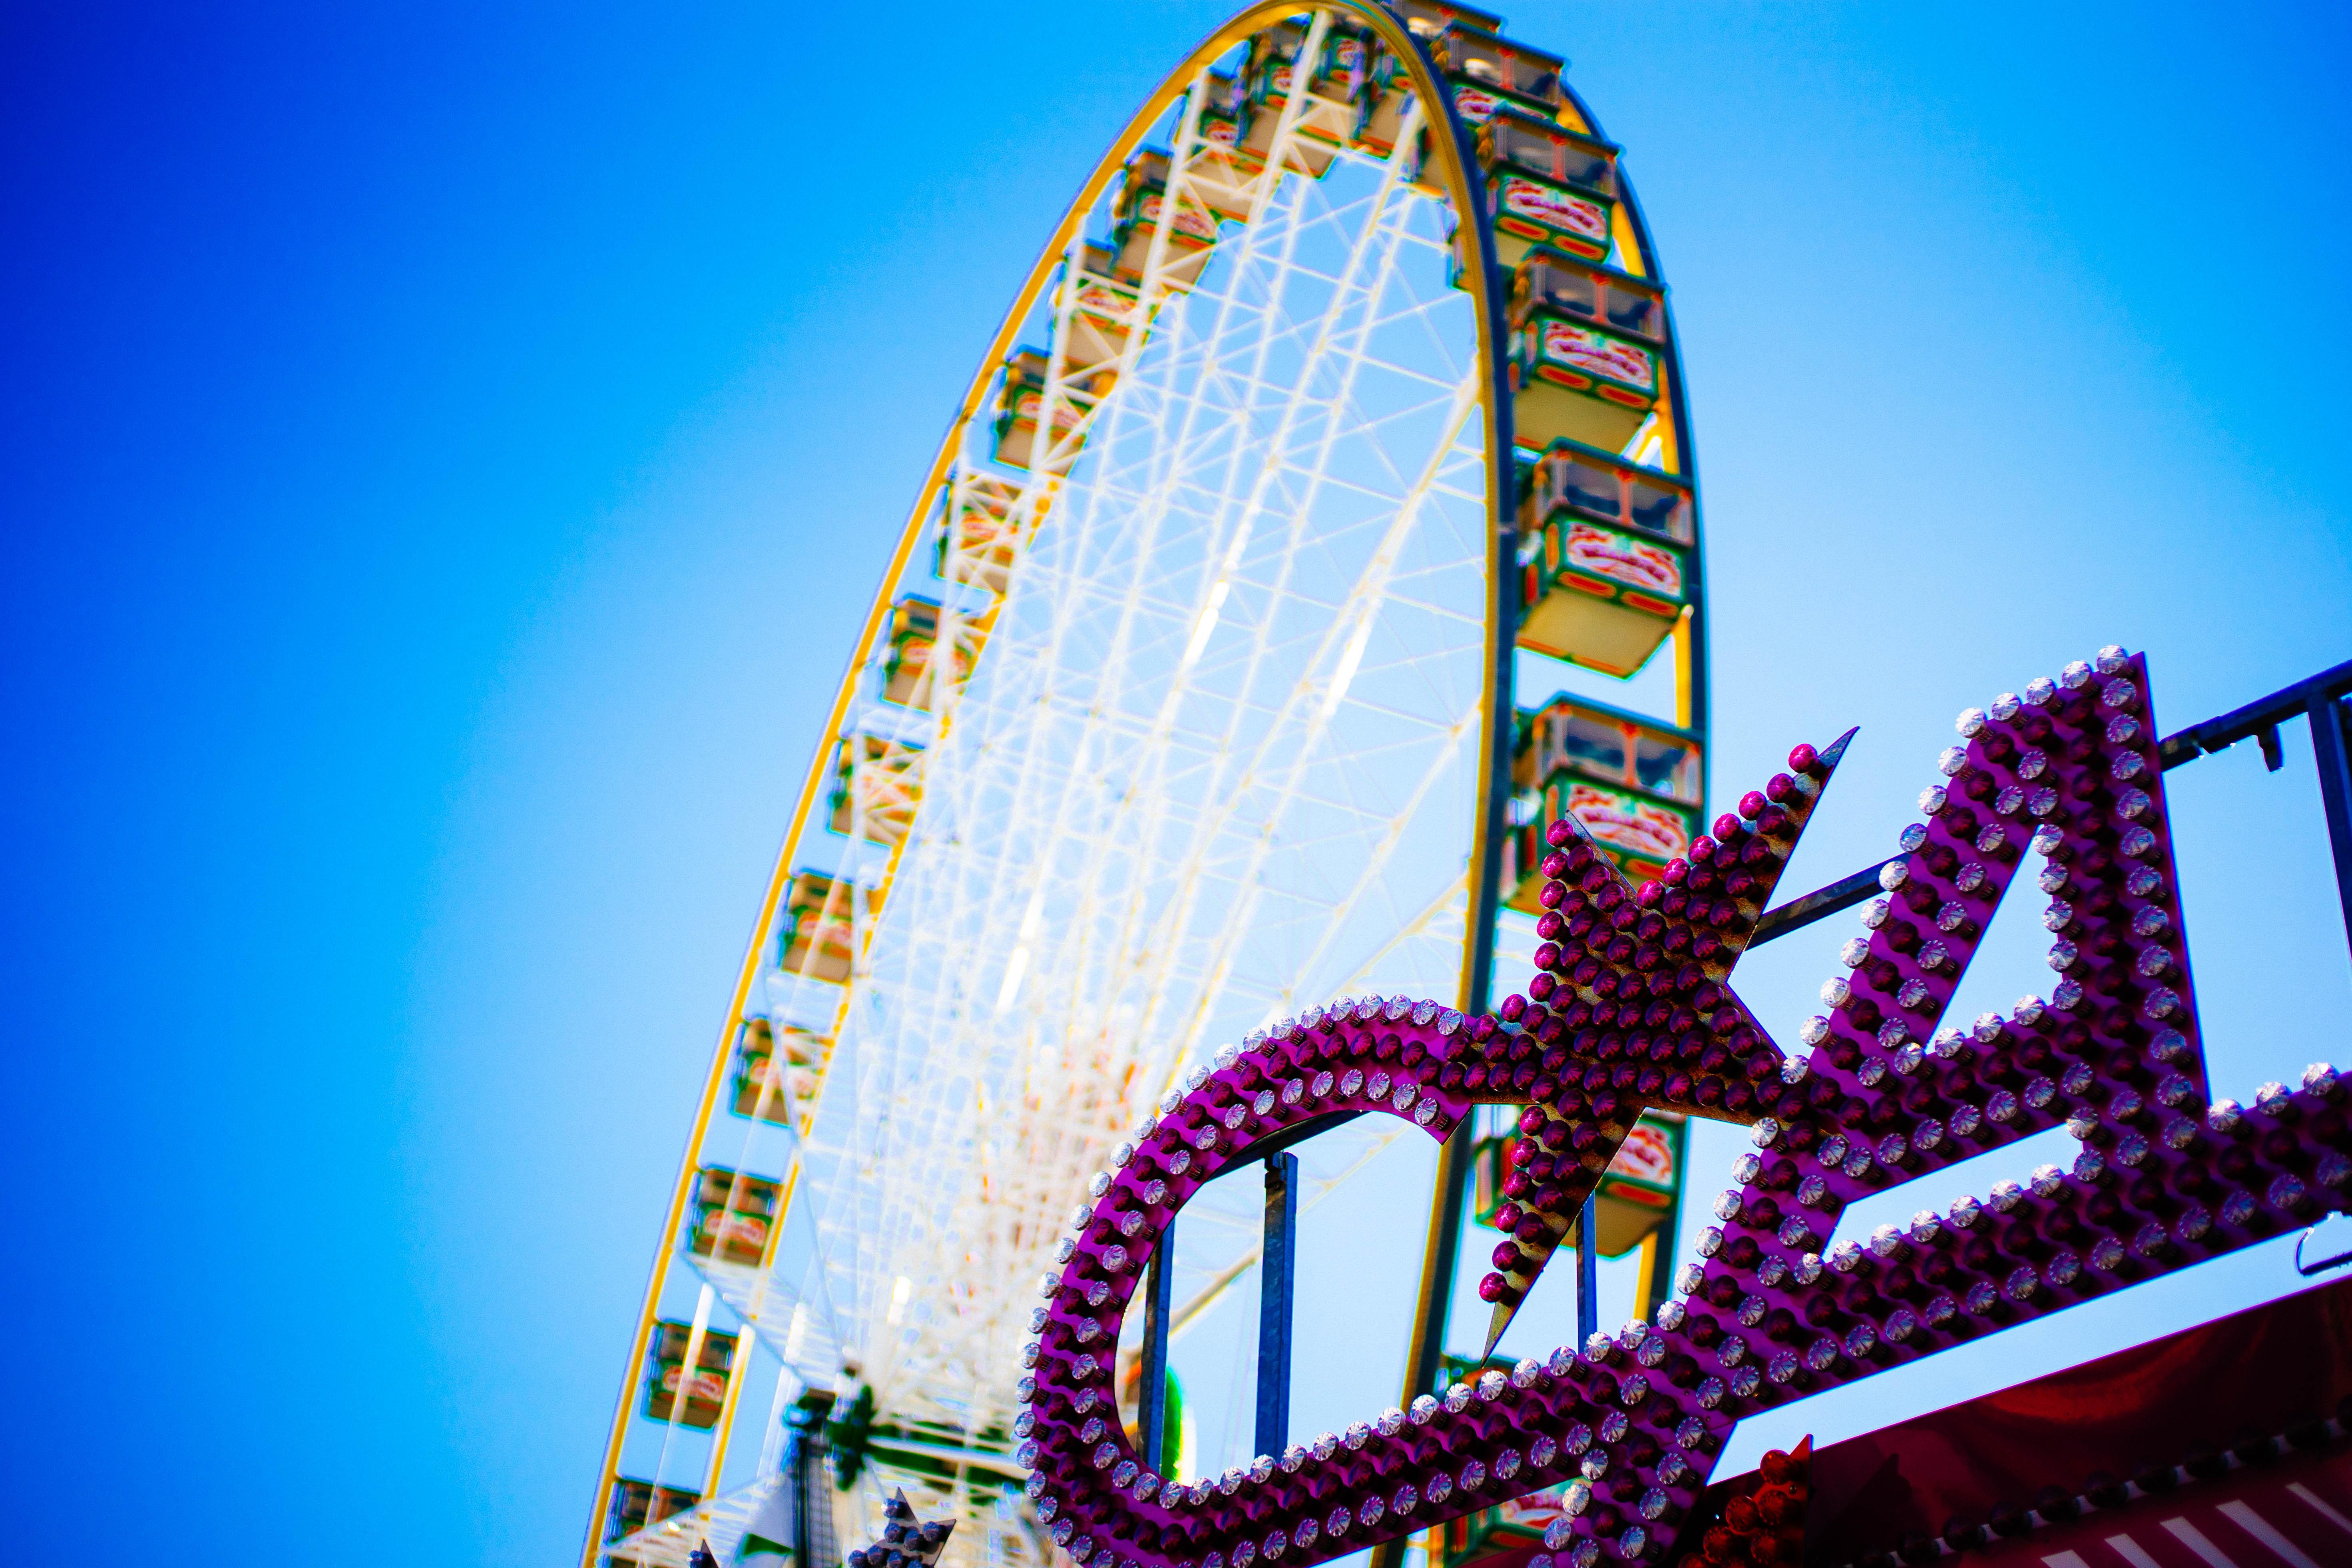 parc attraction 50